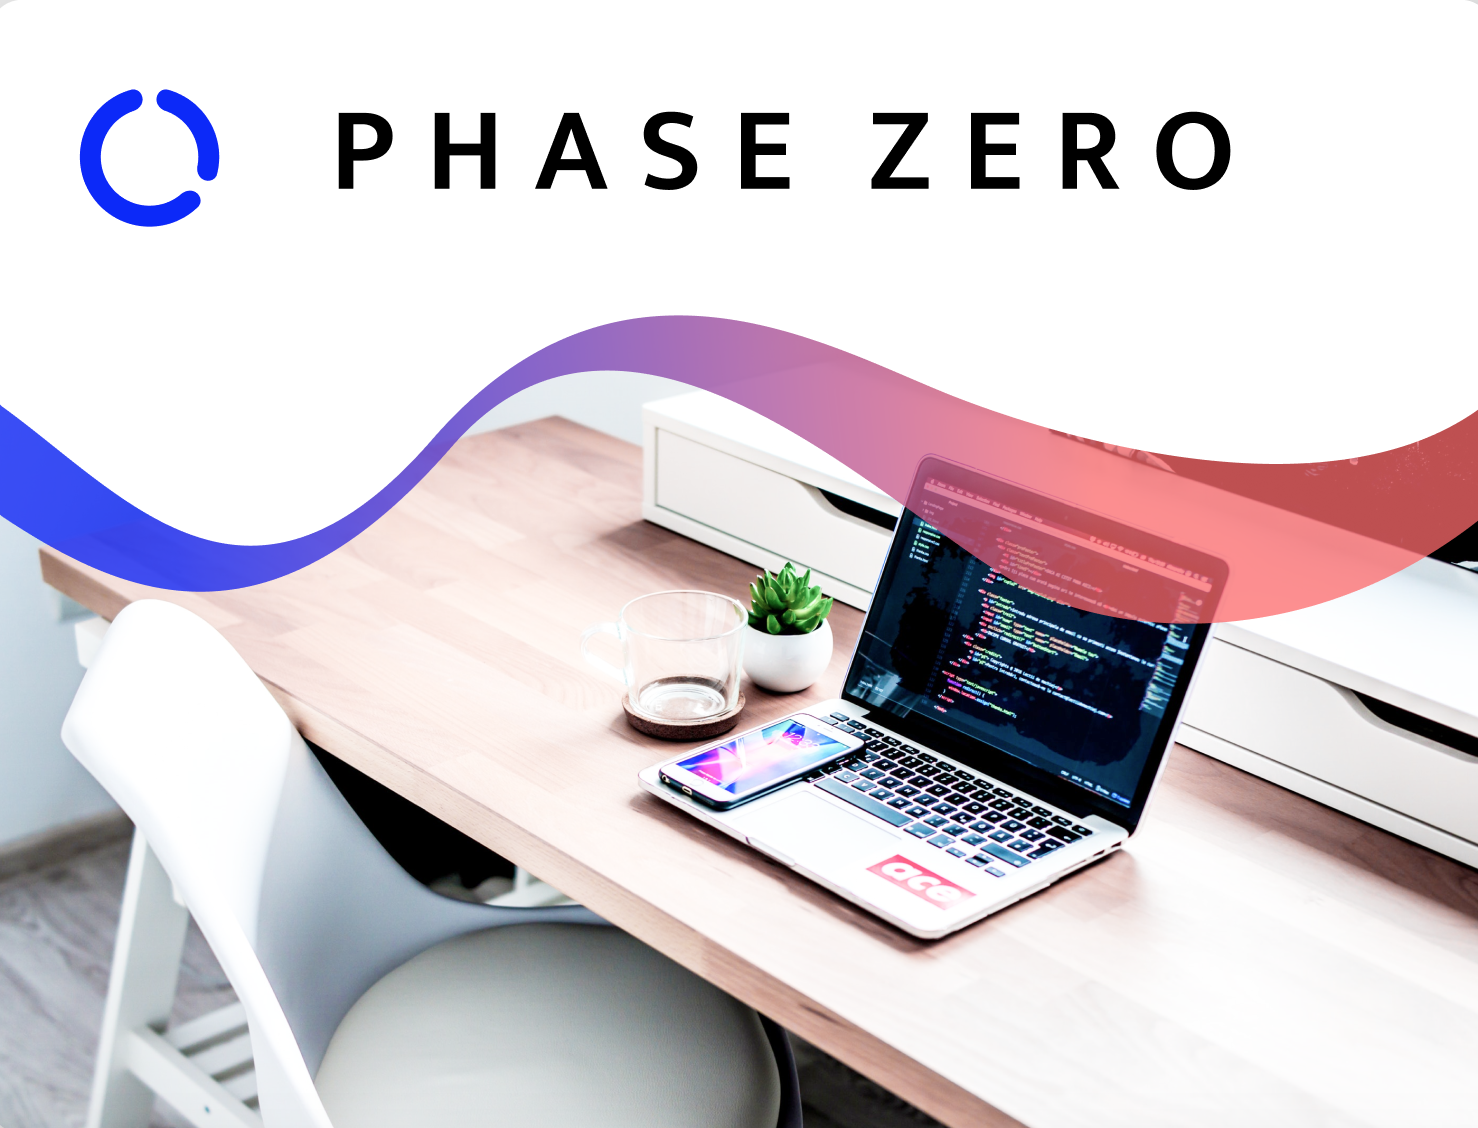 Phase Zero